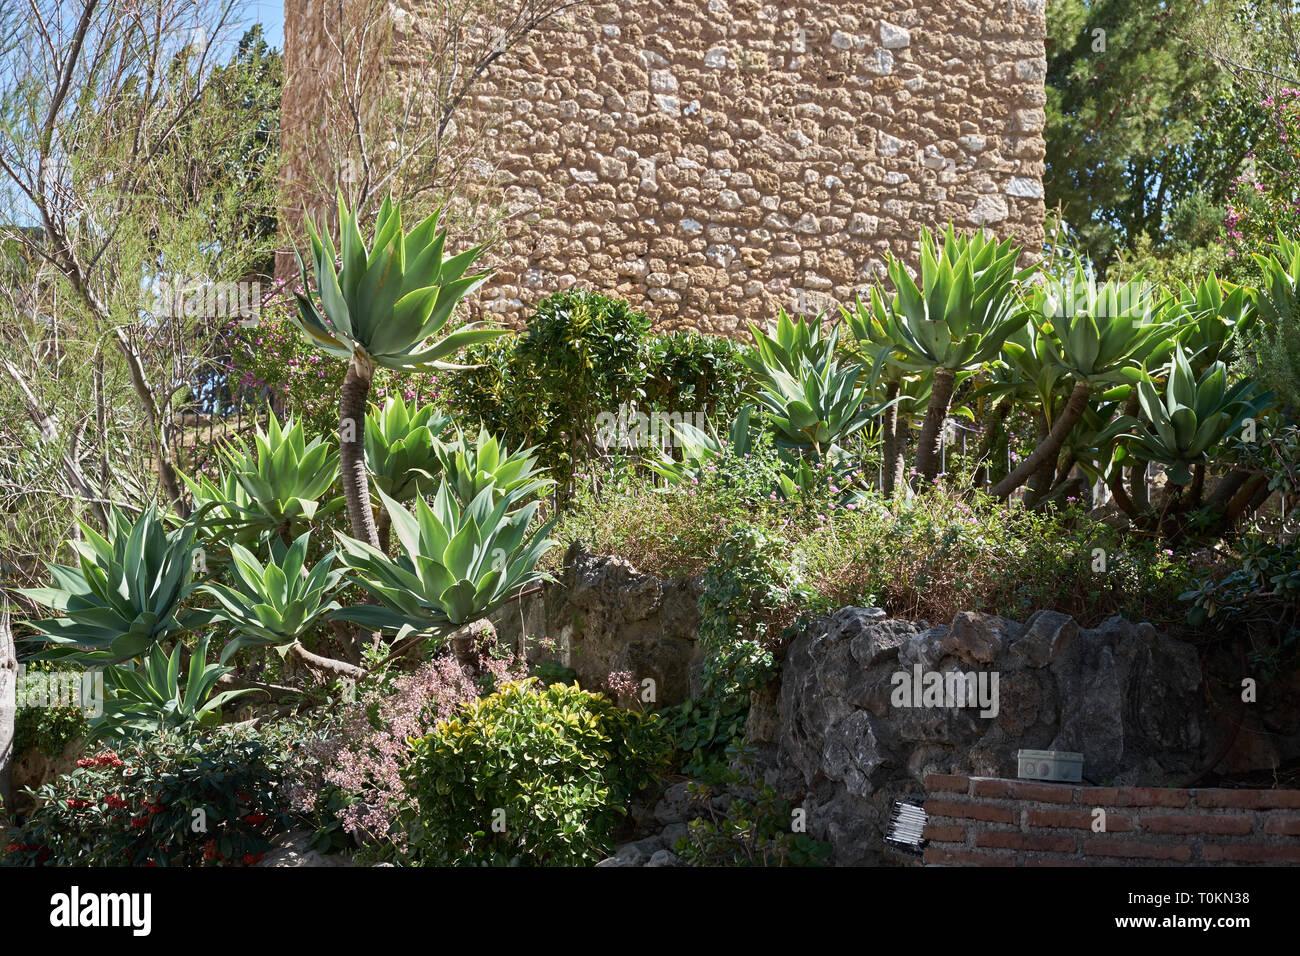 Agave attenuata. Mijas, Málaga, Spain. - Stock Image